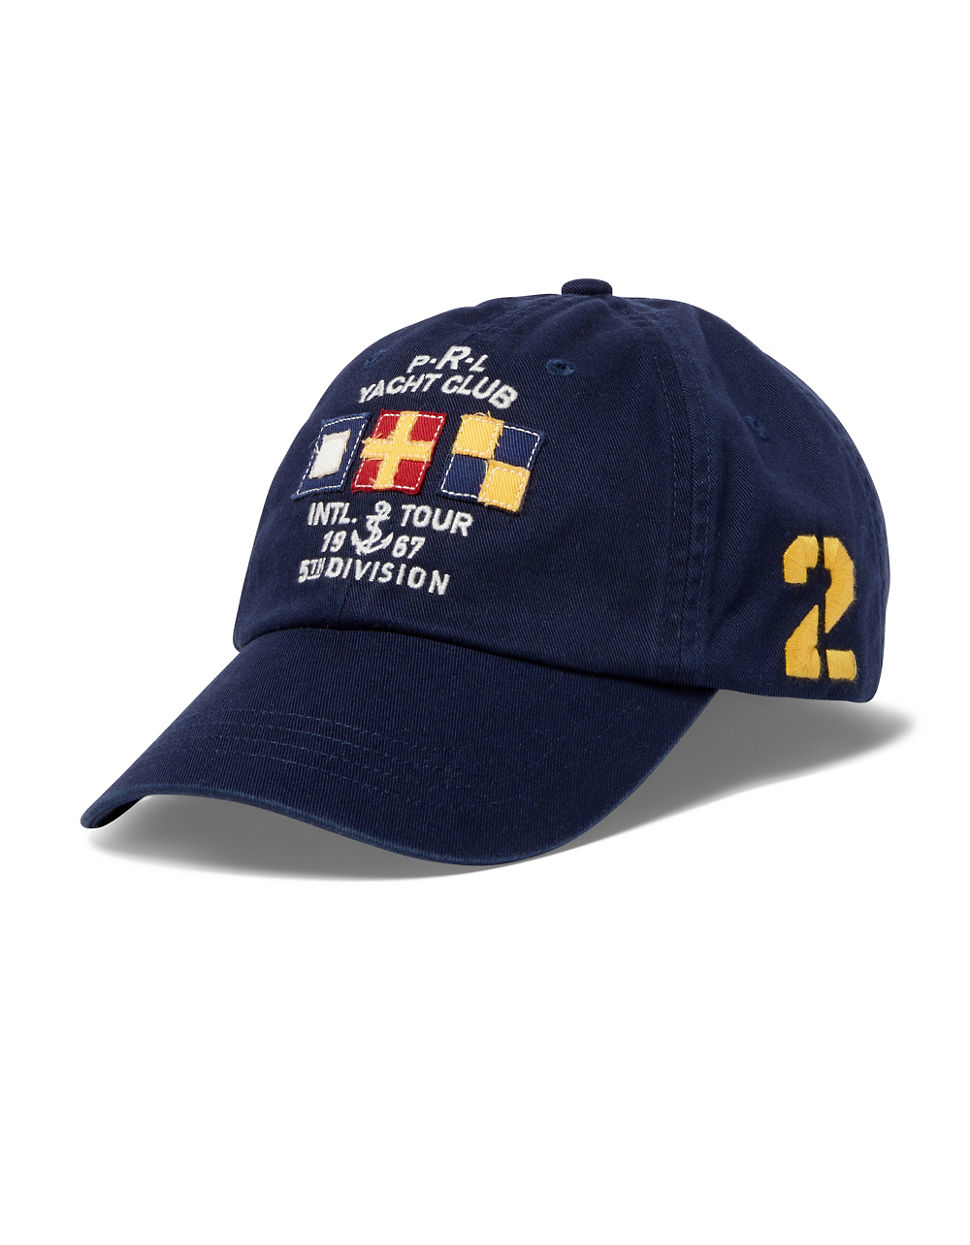 polo ralph lauren nautical 39 2 39 sports cap in black for men. Black Bedroom Furniture Sets. Home Design Ideas